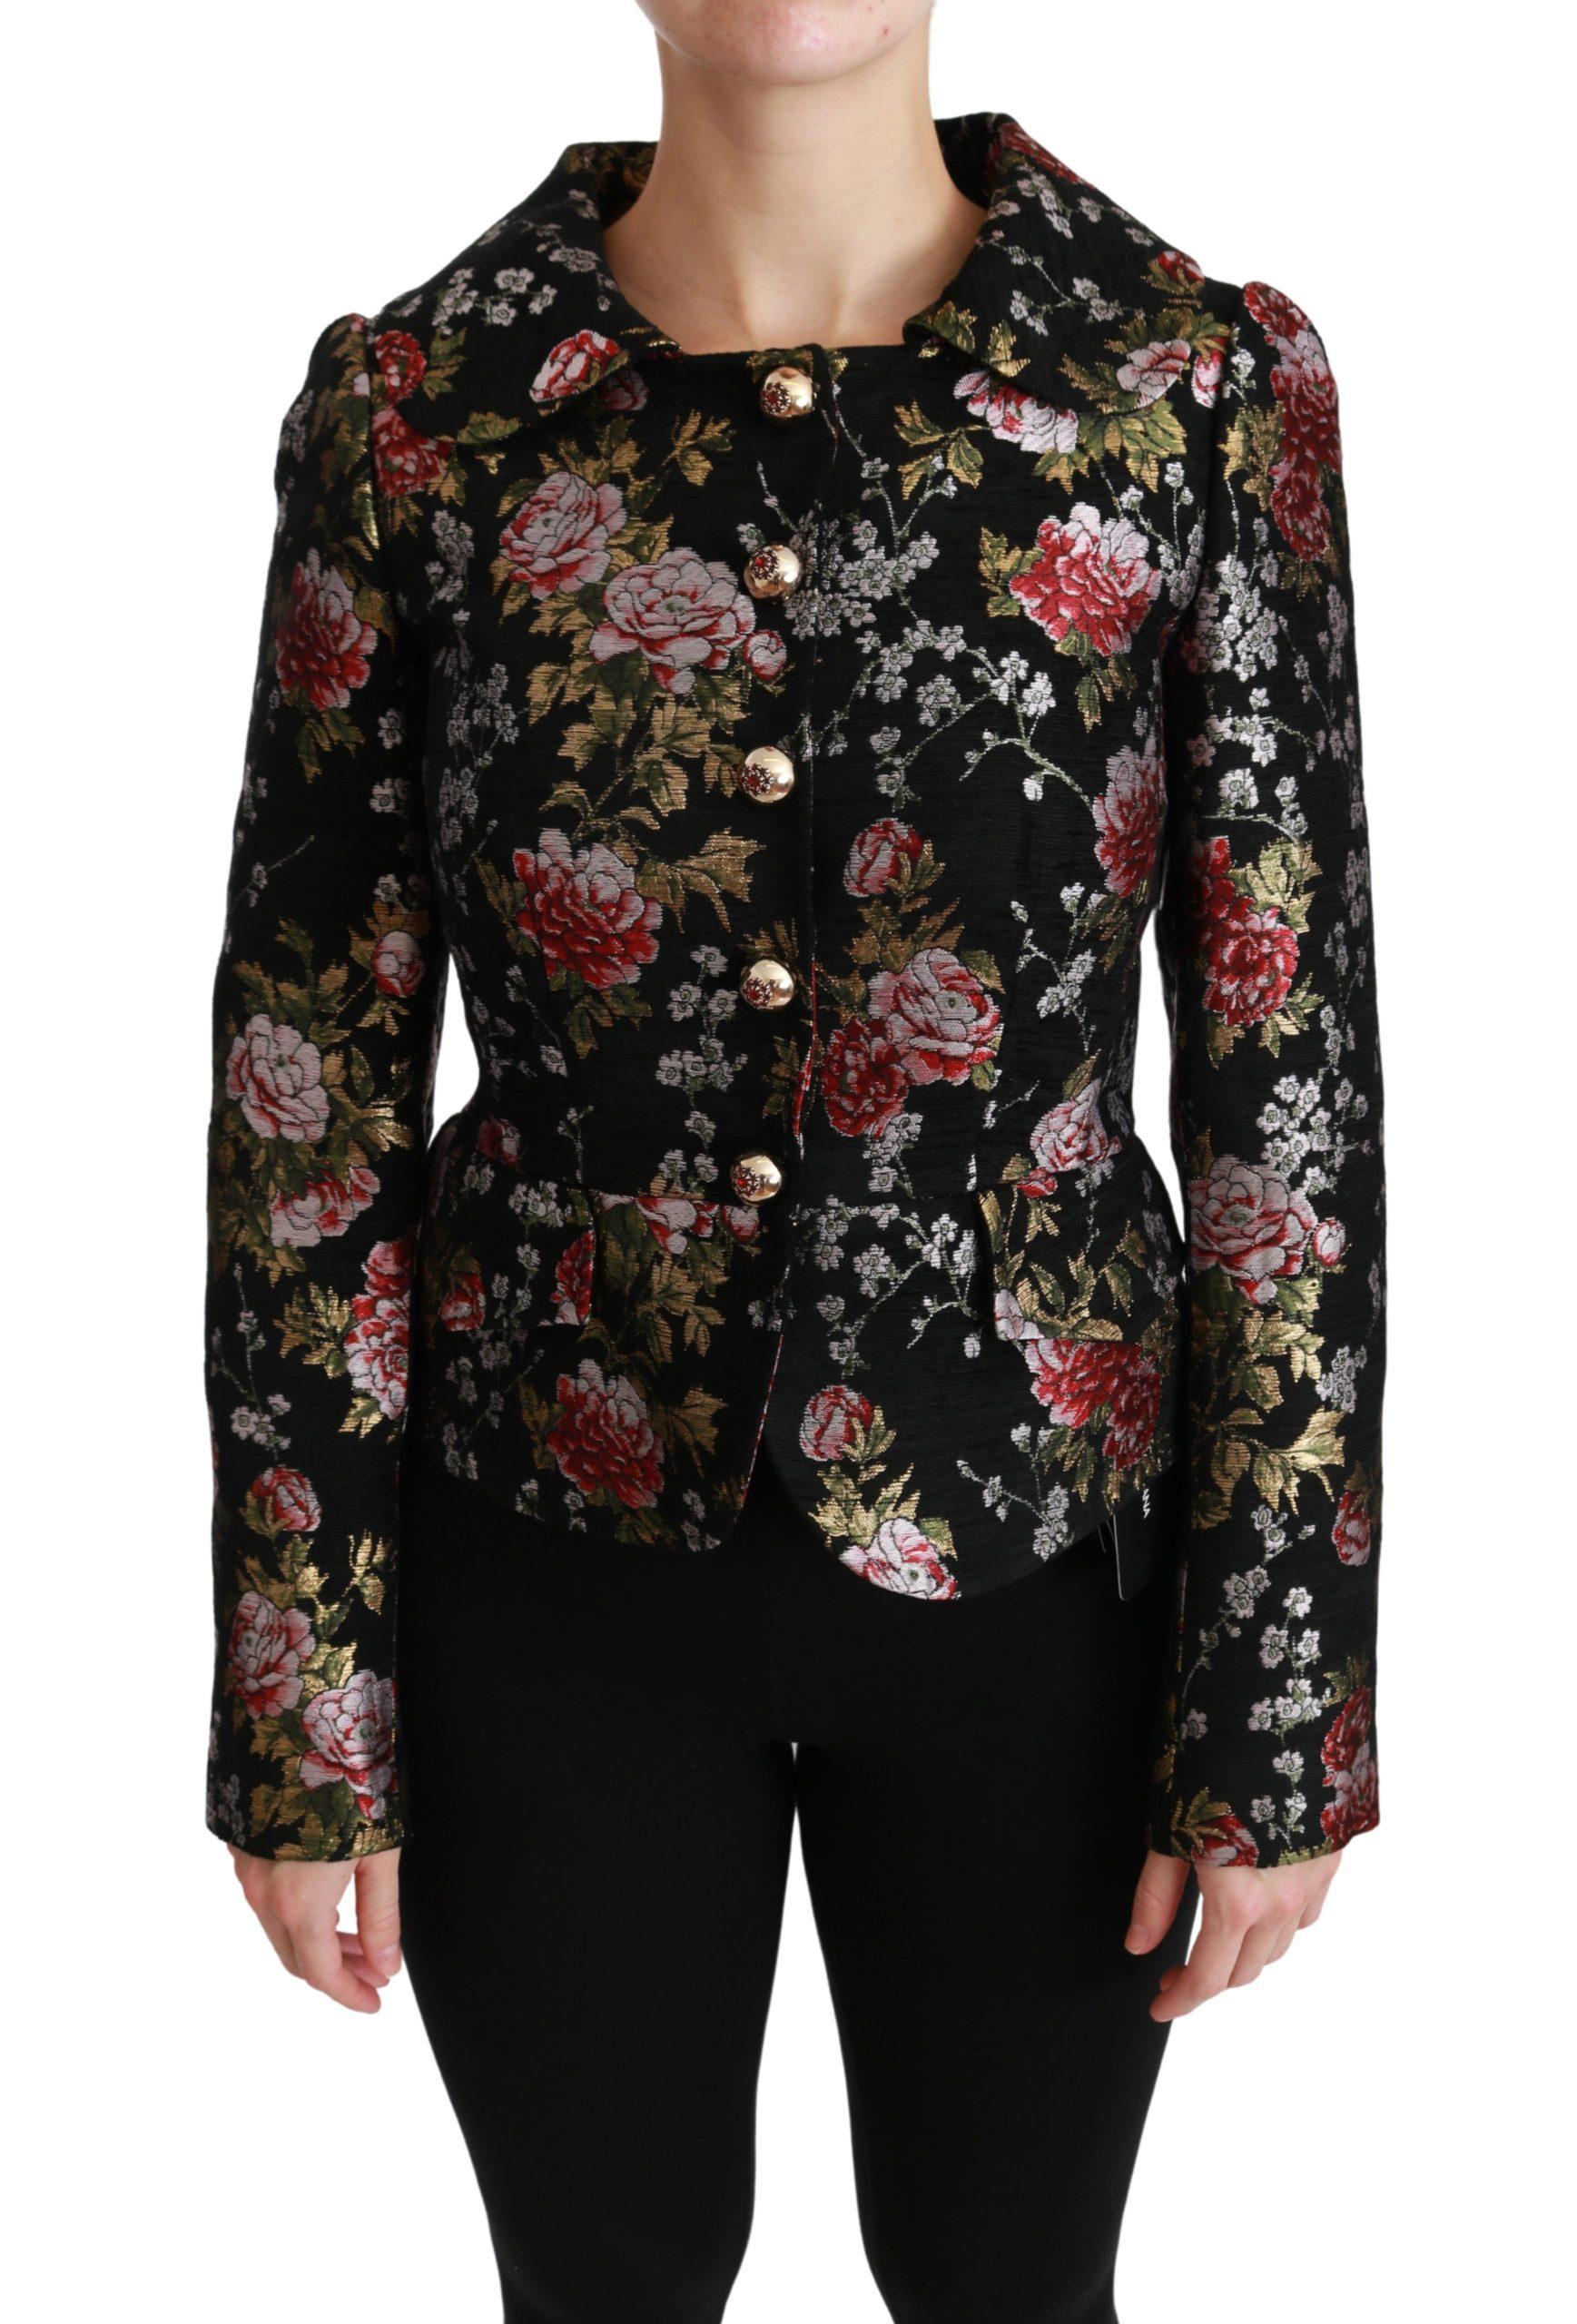 Dolce & Gabbana Women's Floral Brocade Jacket Black JKT2523 - IT40|S